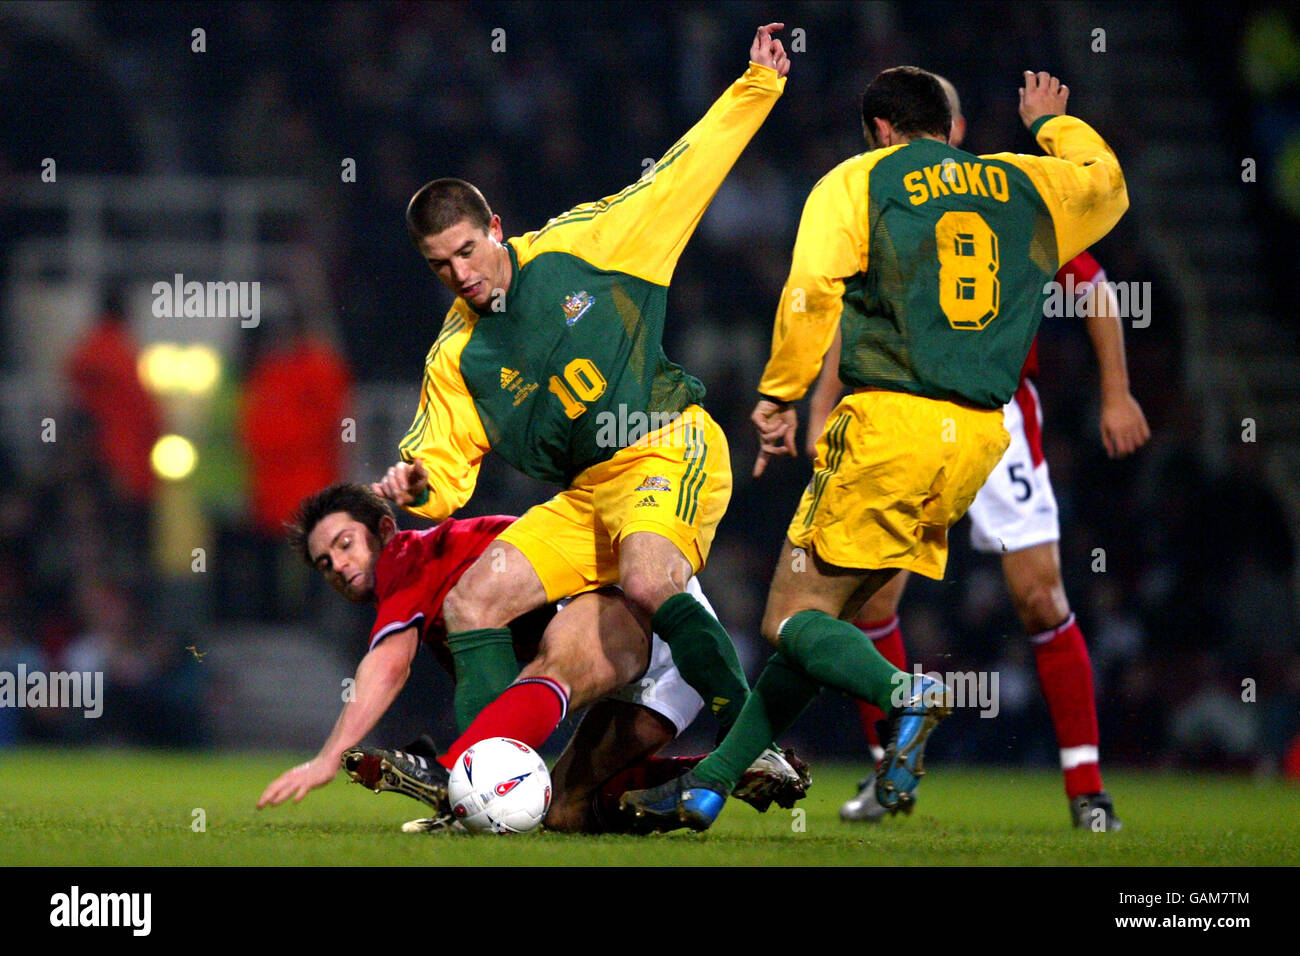 Soccer - International Friendly - England v Australia Stock Photo